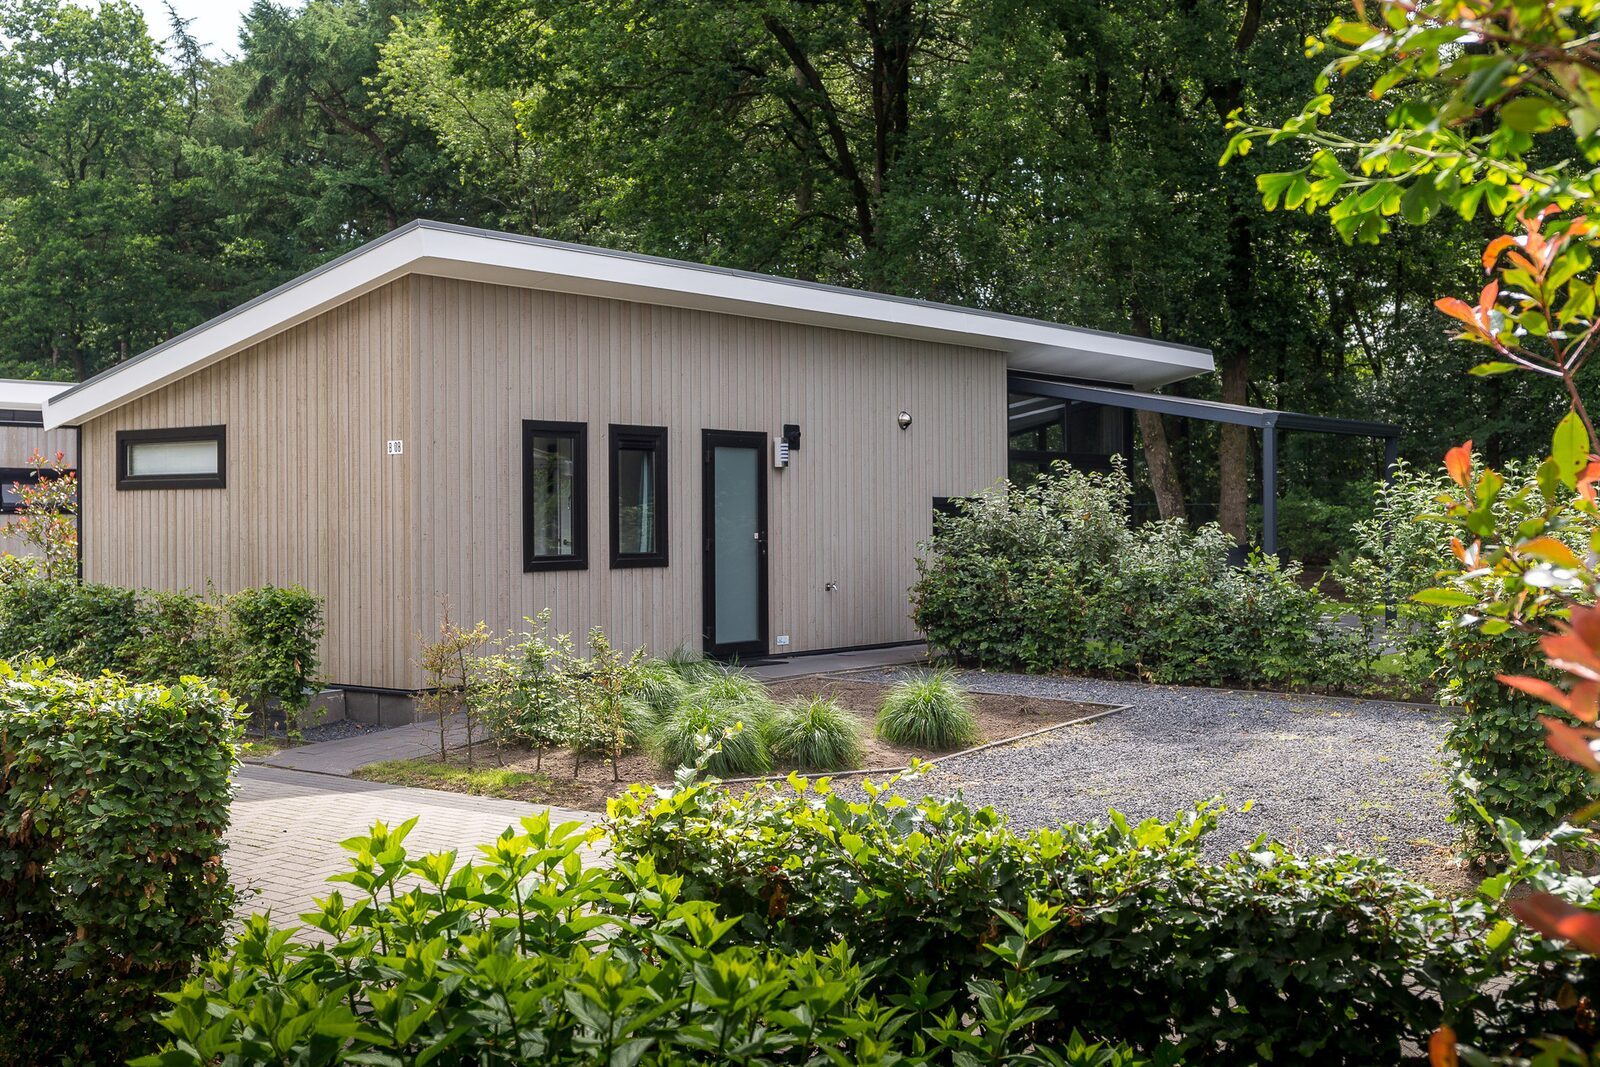 Bos Lodge 55 6 personen